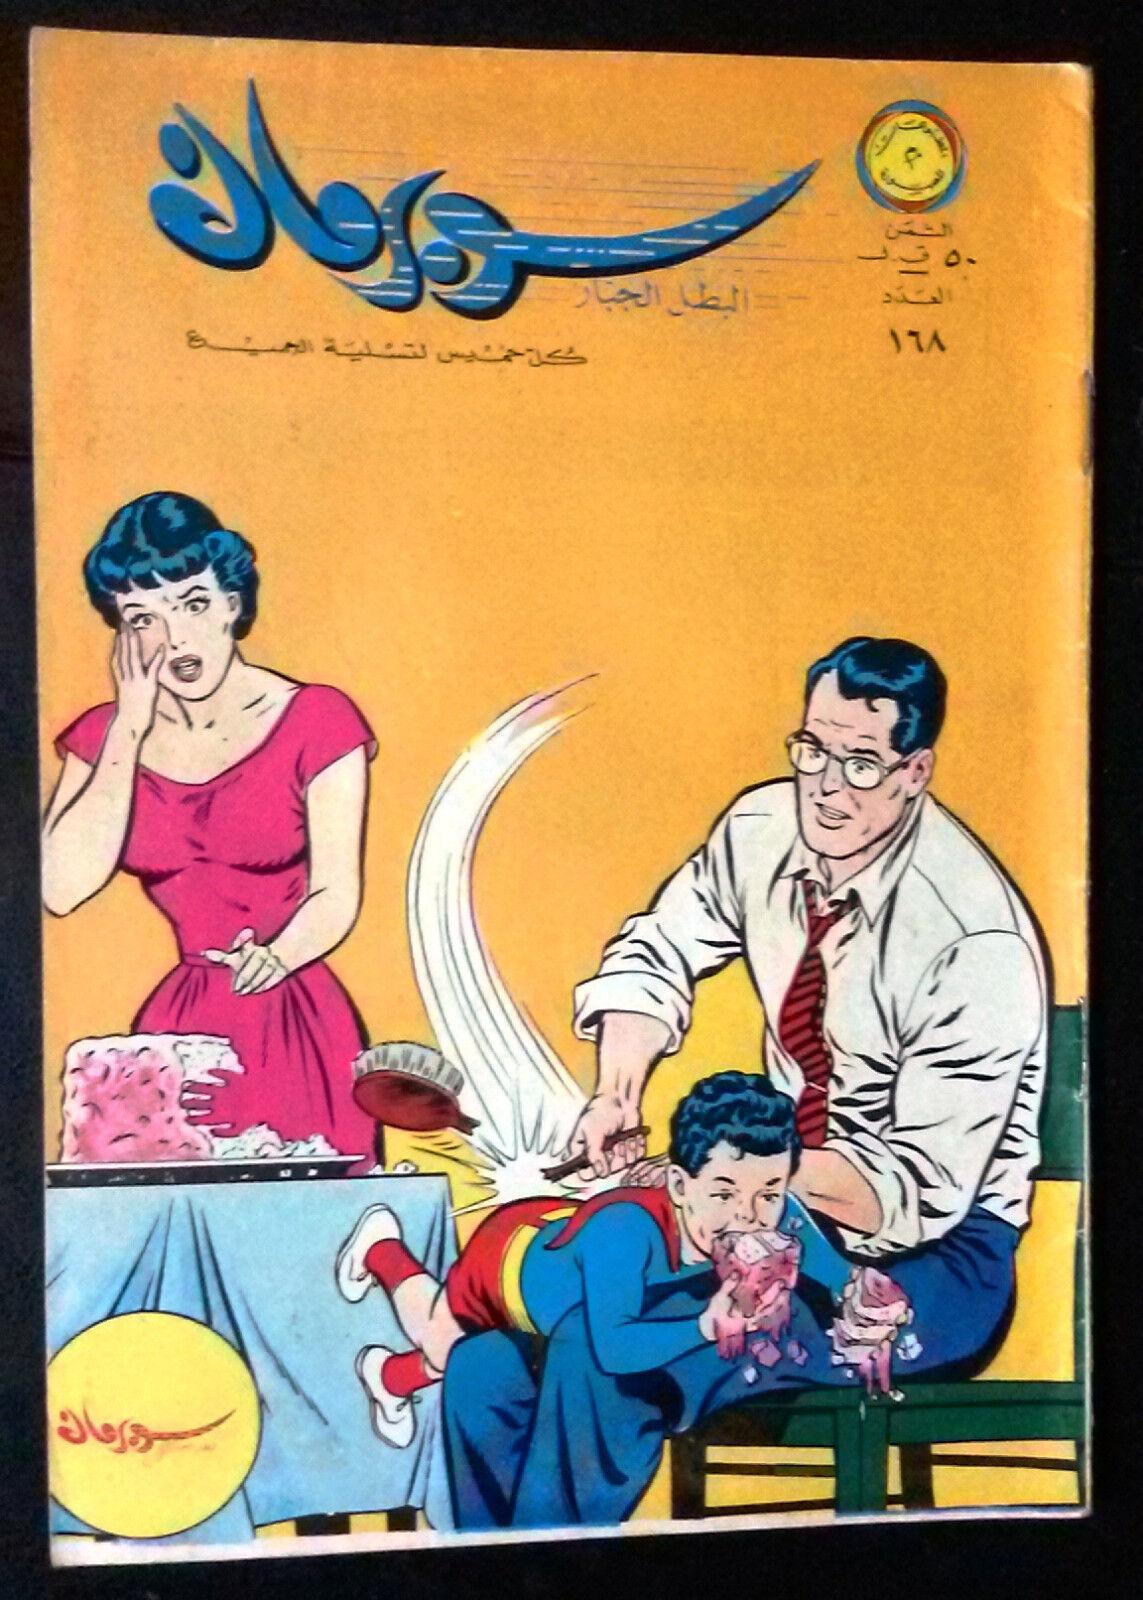 Superman Lebanese Original Arabic Rare Comics 1967 No.168 Farbeed سوبرمان كومكس